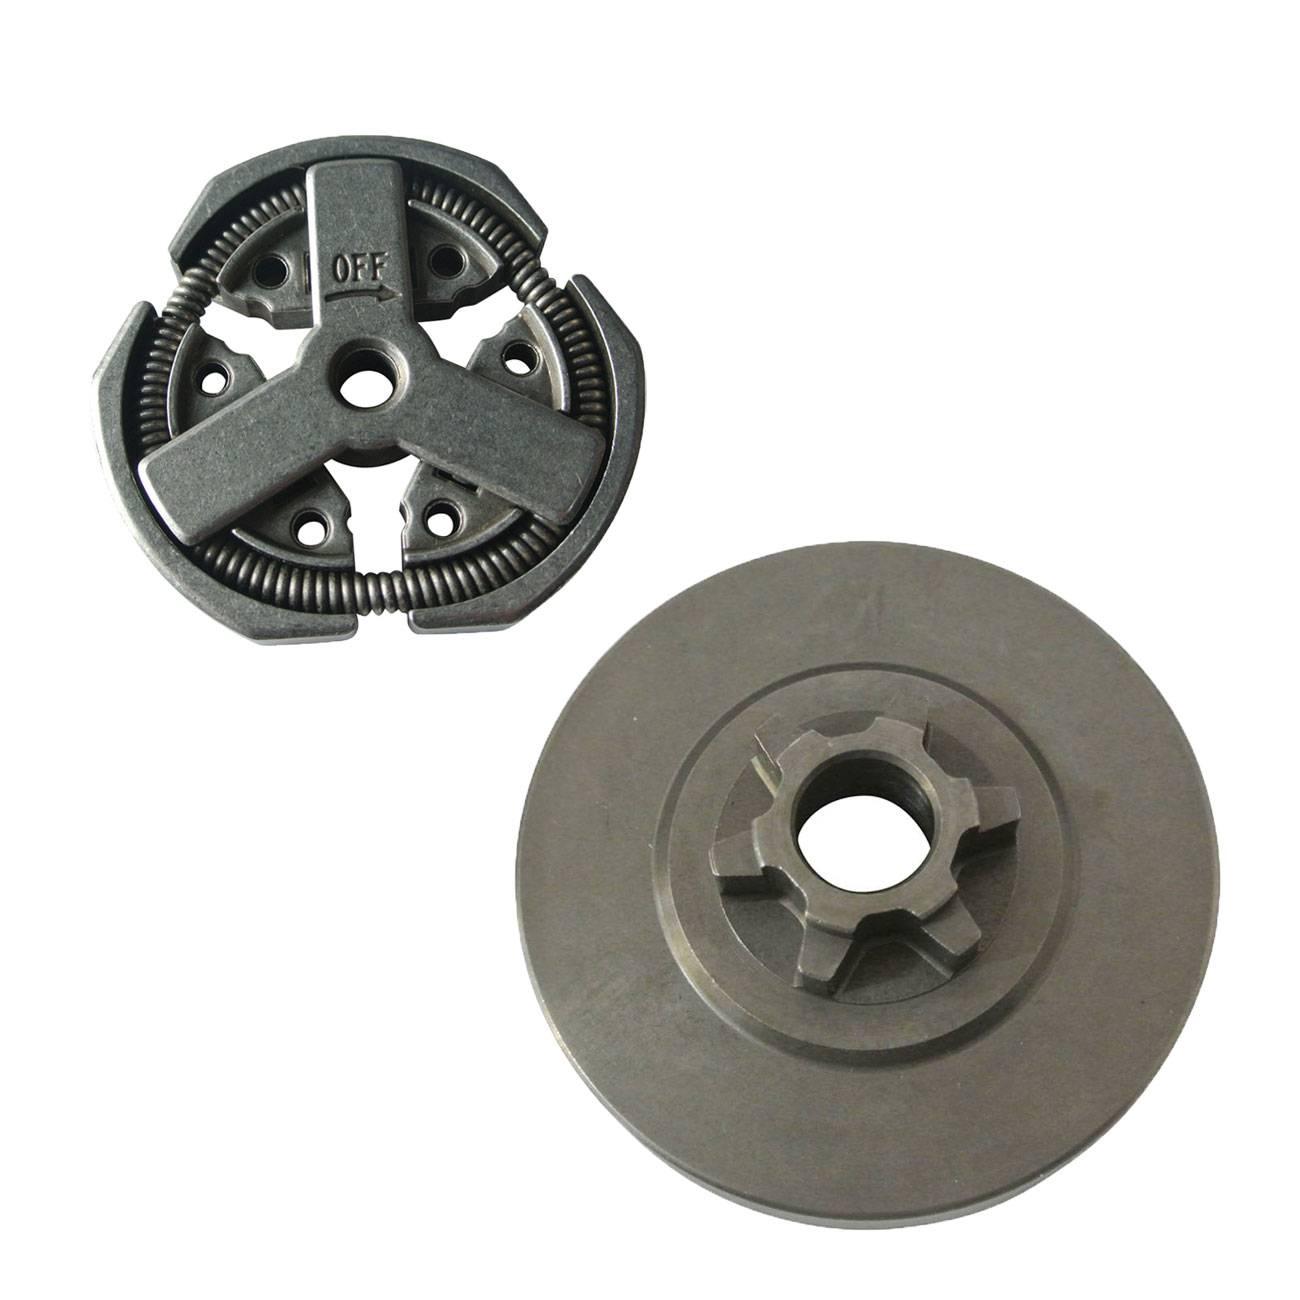 Clutch Assy & Clutch Drum For Komatsu Chainsaw 3800 38CC Parts